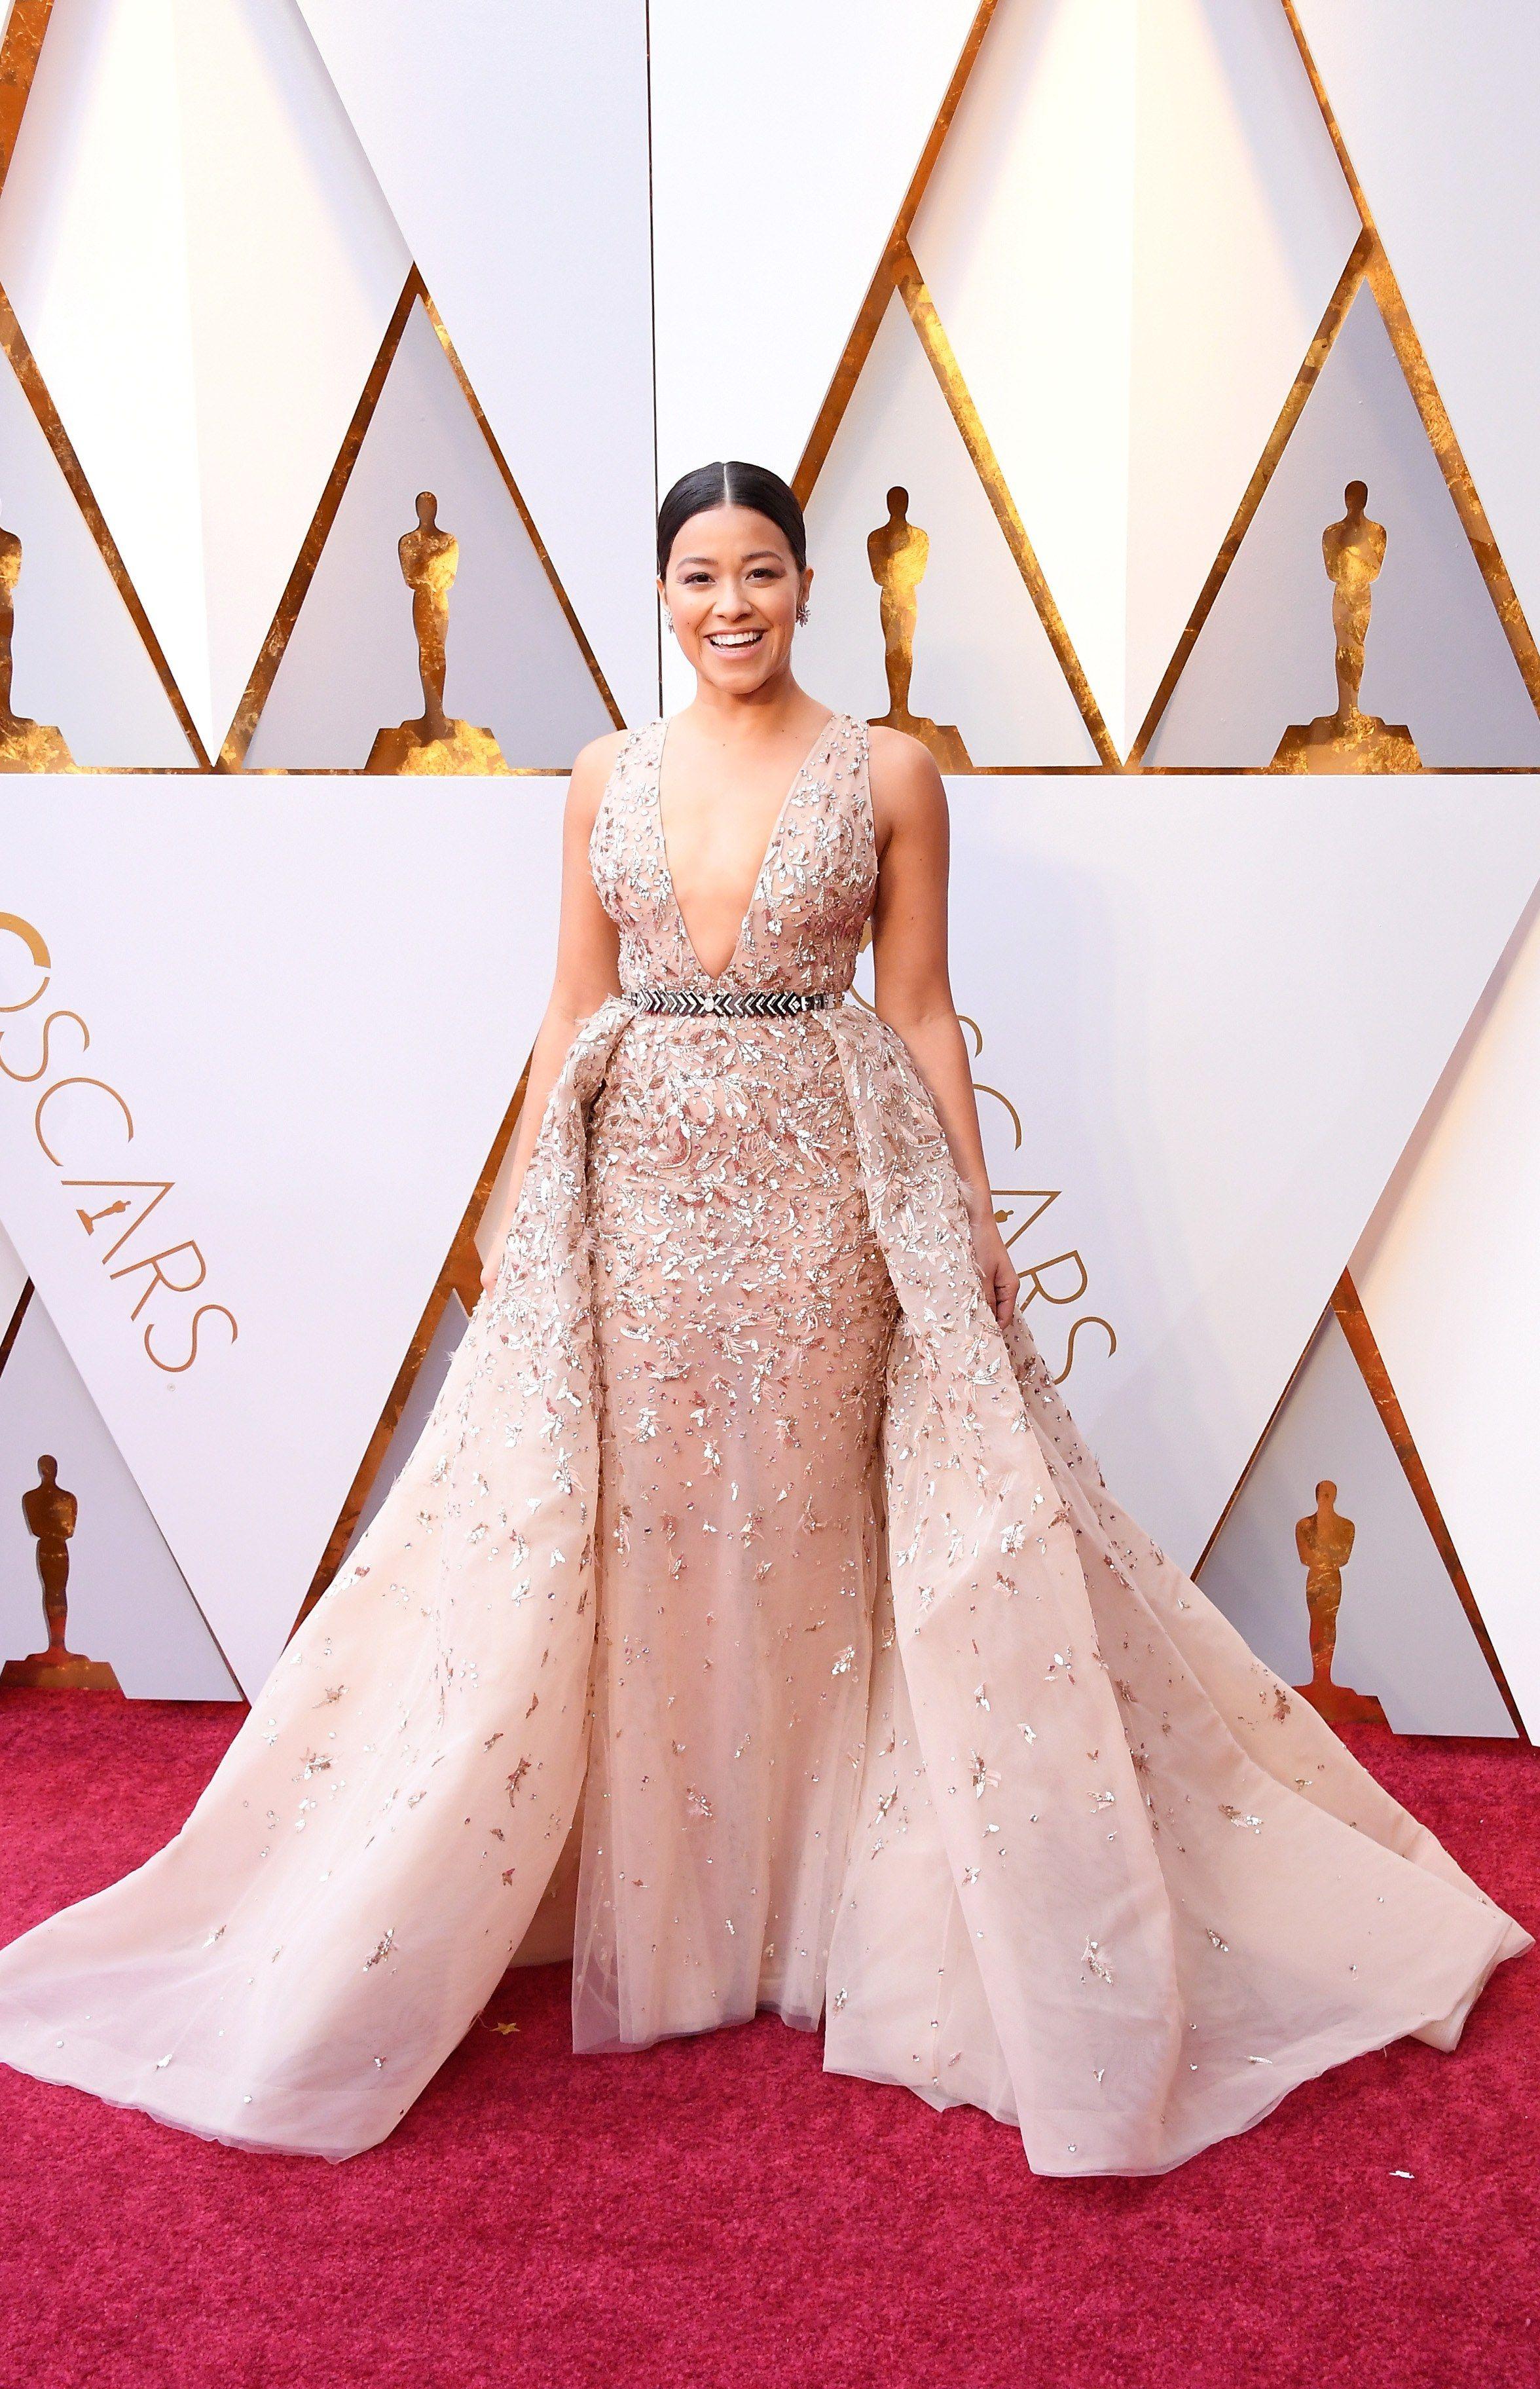 2018 Oscars: Red Carpet Photos - PopCrush Oscars 2018 fashion photo gallery